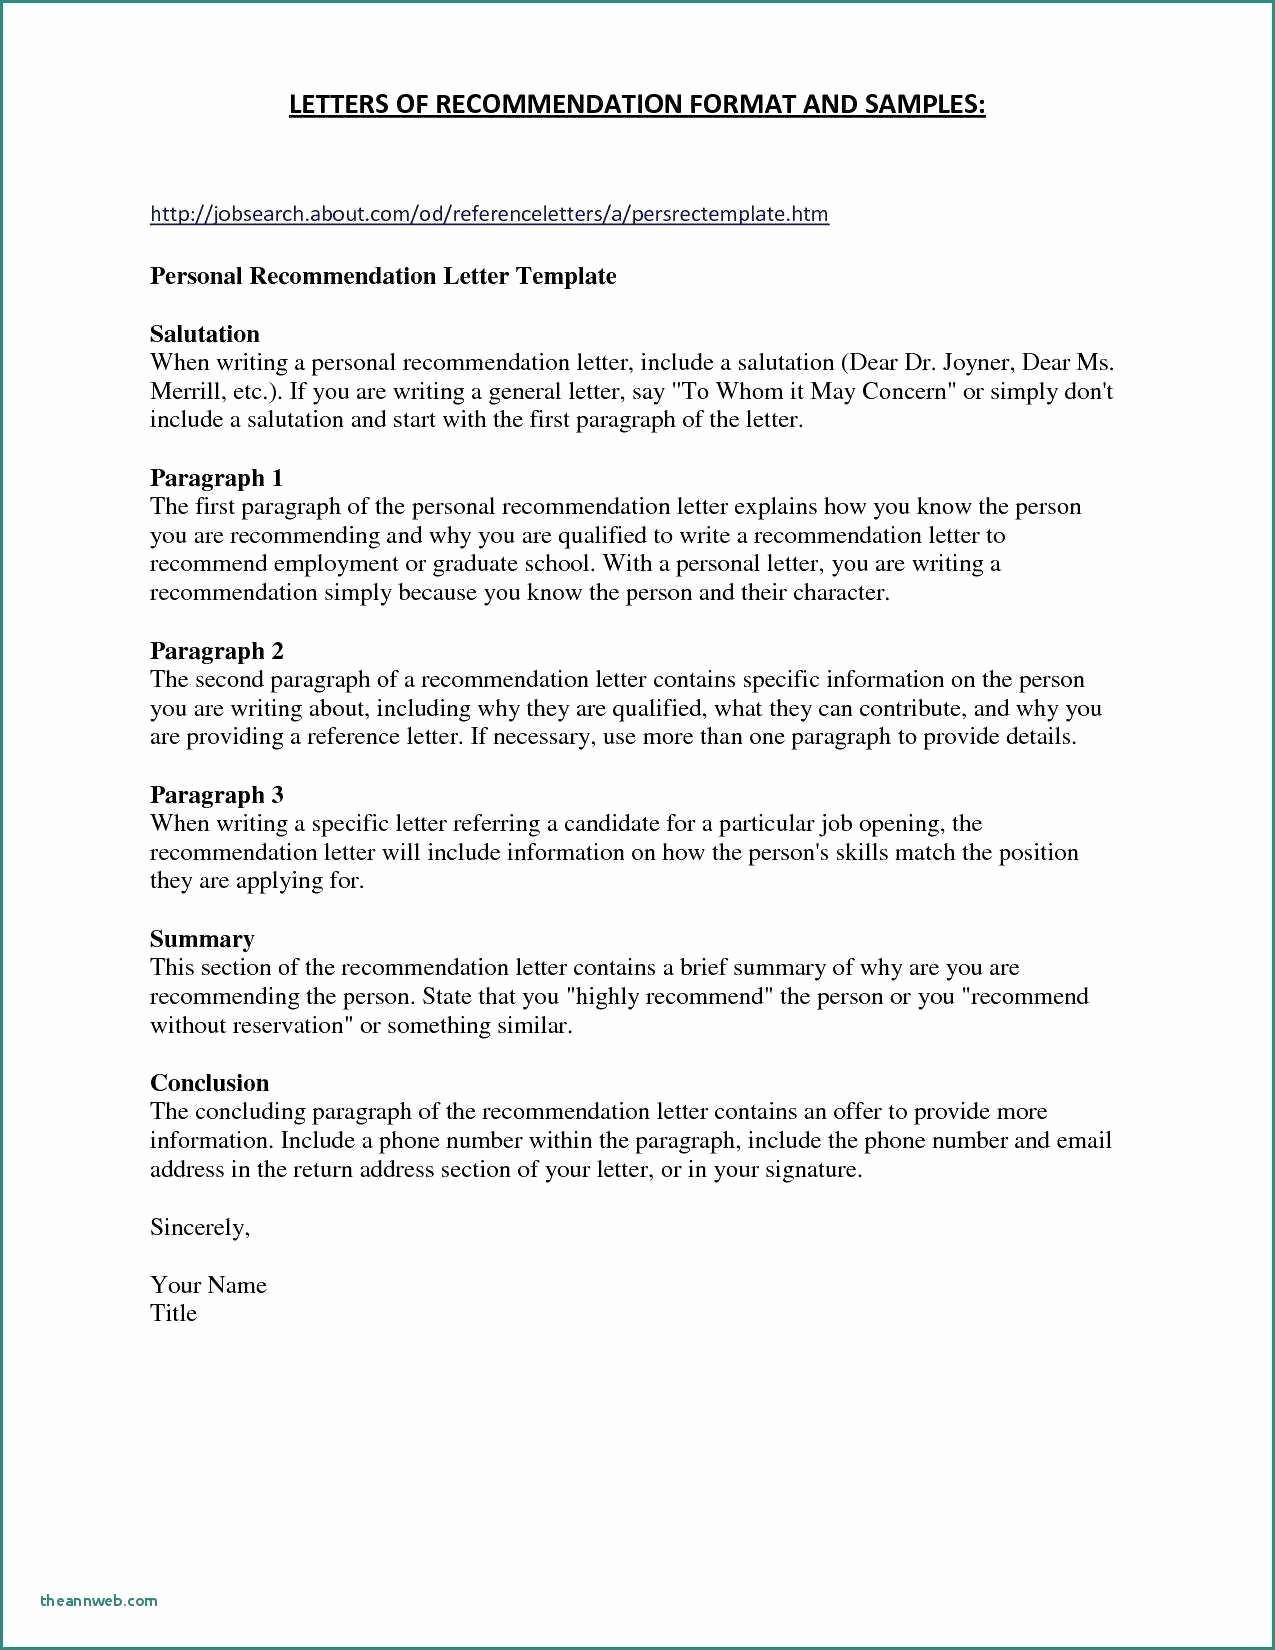 Standard Business Letter format Template Beautiful 20 Standard Business Letter Template New Business Letter